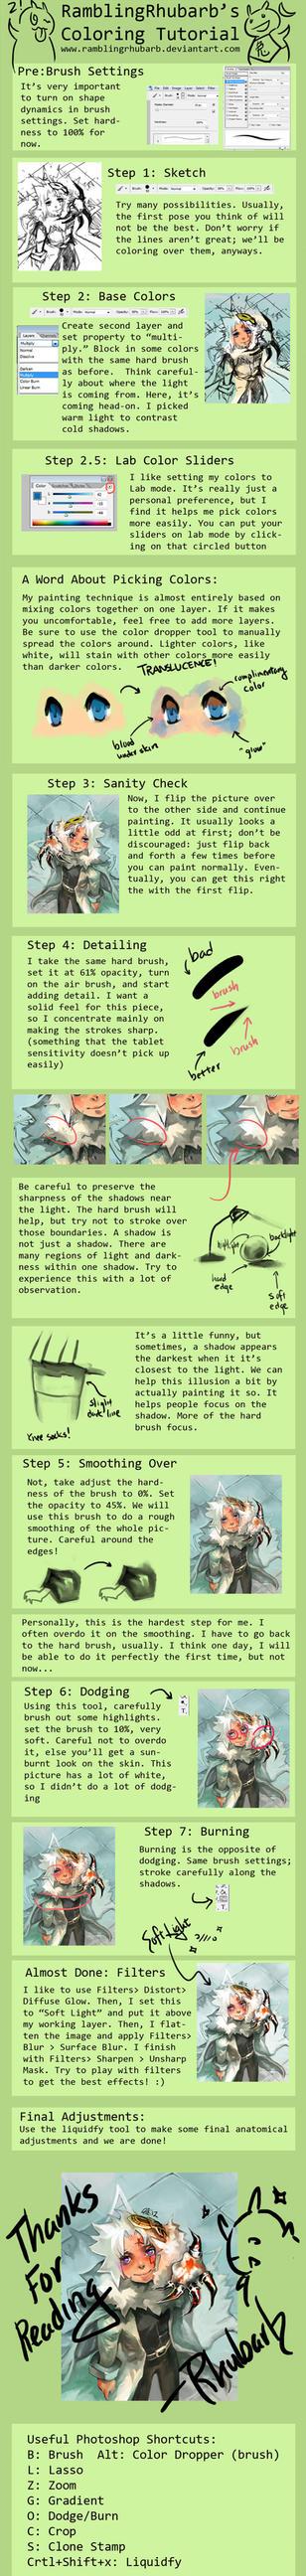 Anime Realism Hard Brush Digital Painting Tutorial by RamblingRhubarb